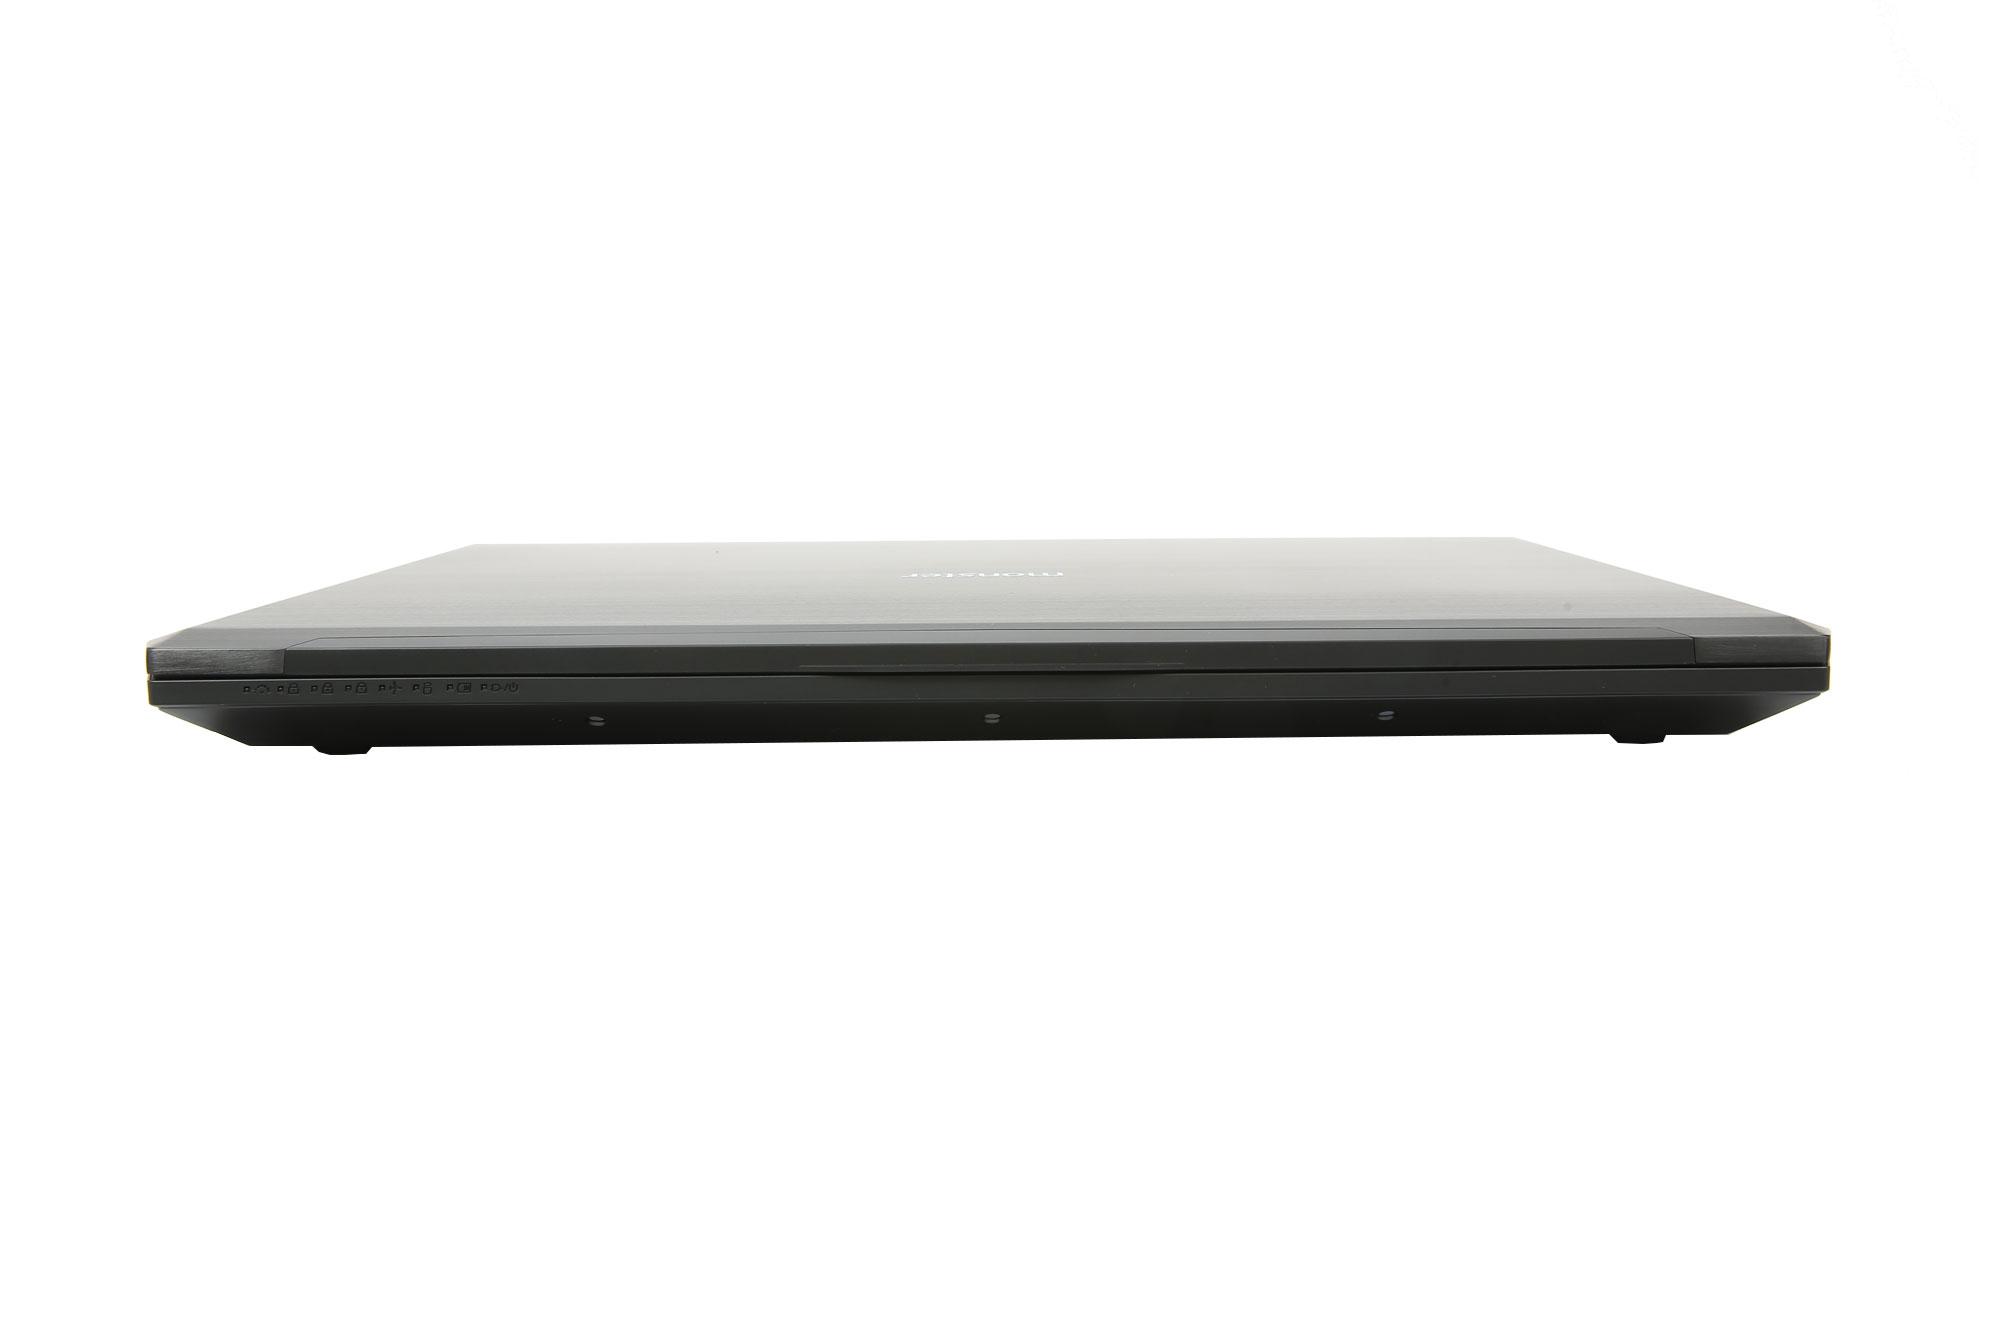 MONSTER® TULPAR T7 V4.1 17.3